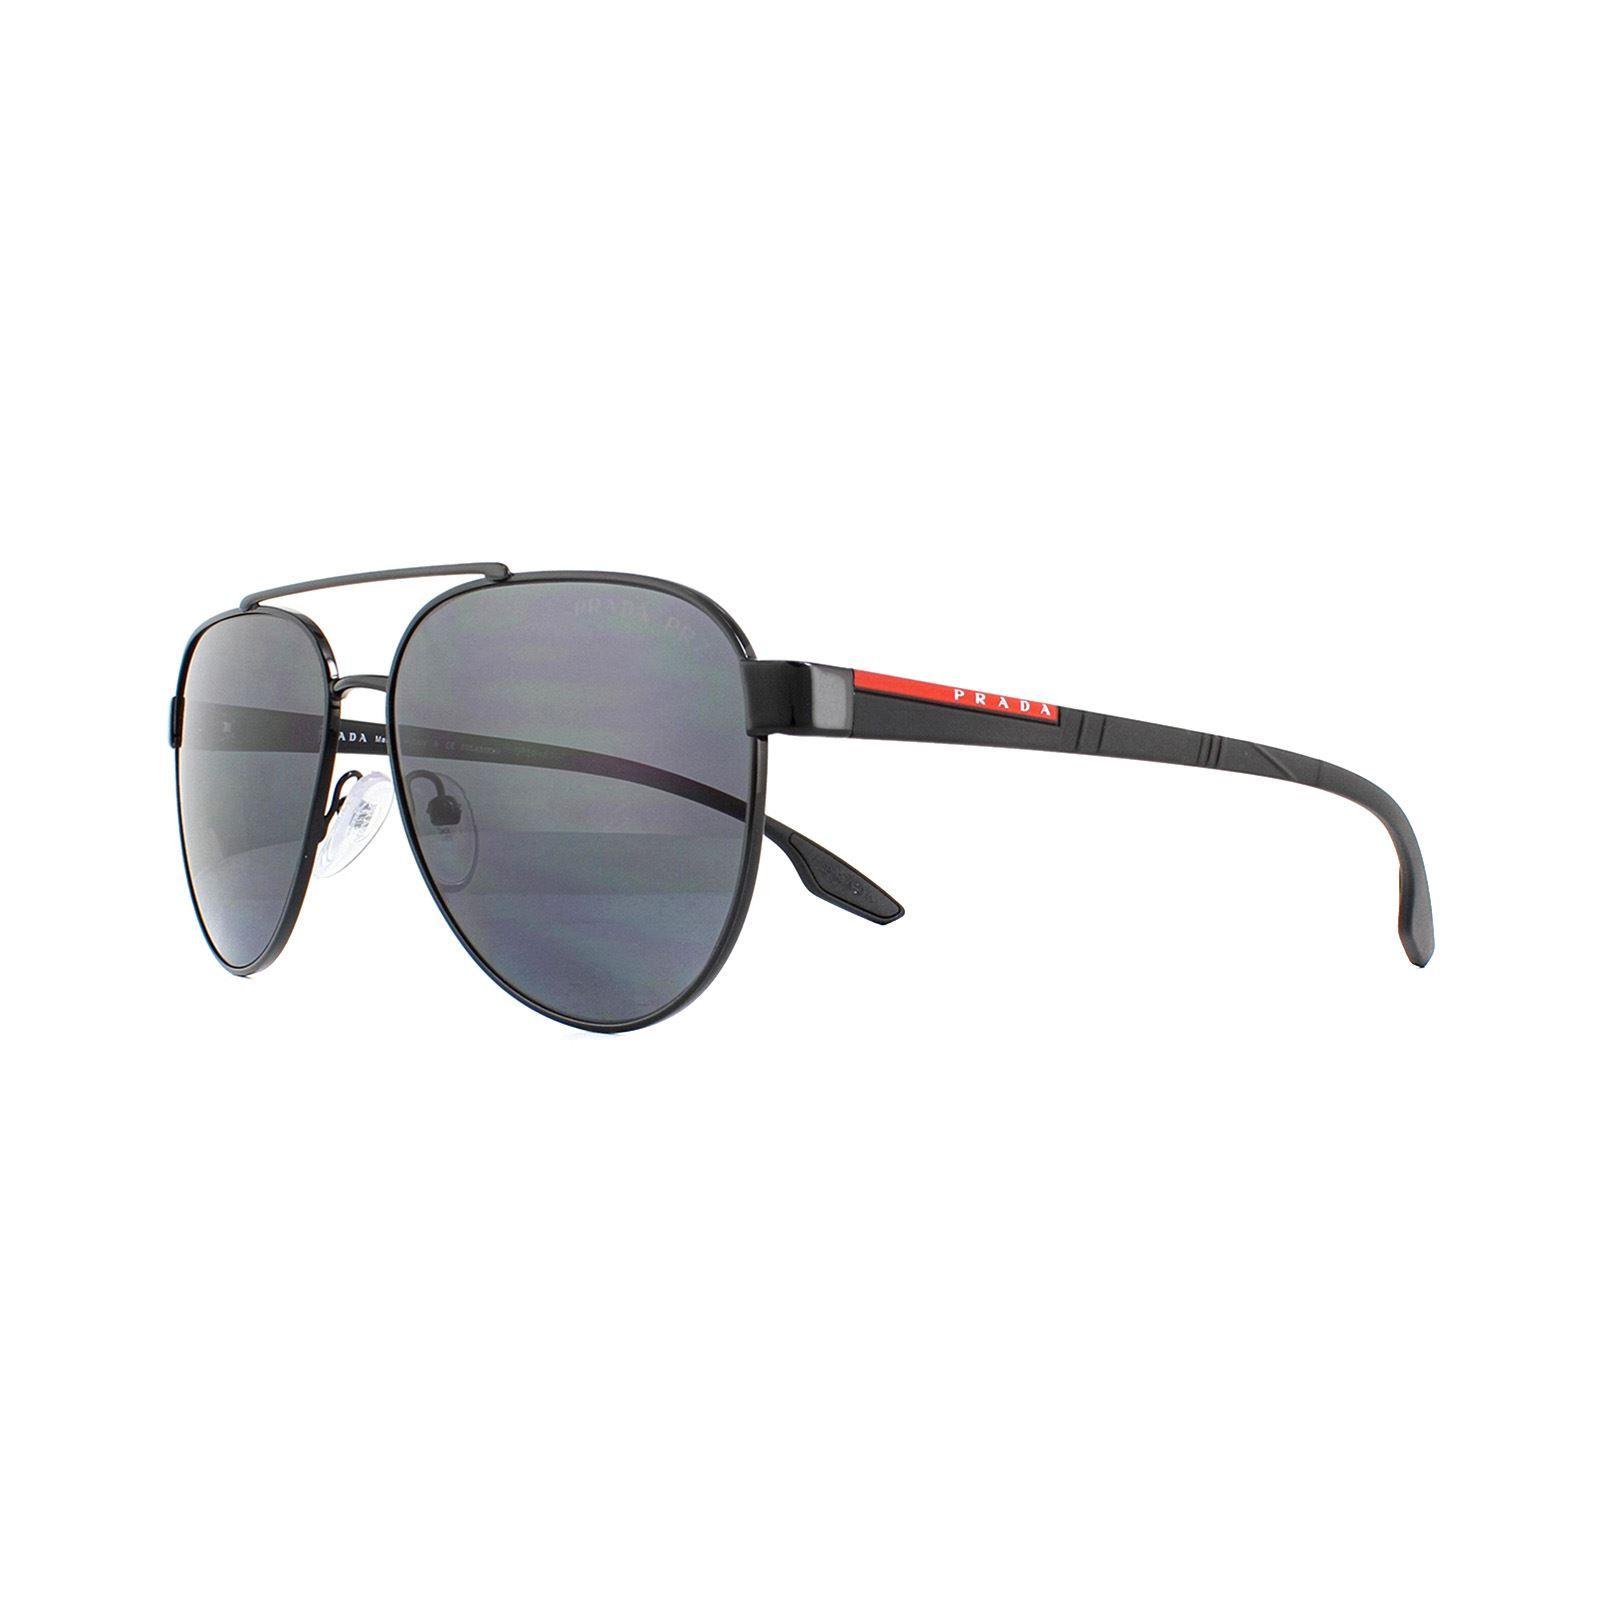 Prada Sport Sunglasses 54TS 1AB5Z1 Aviator Black Grey Polarized